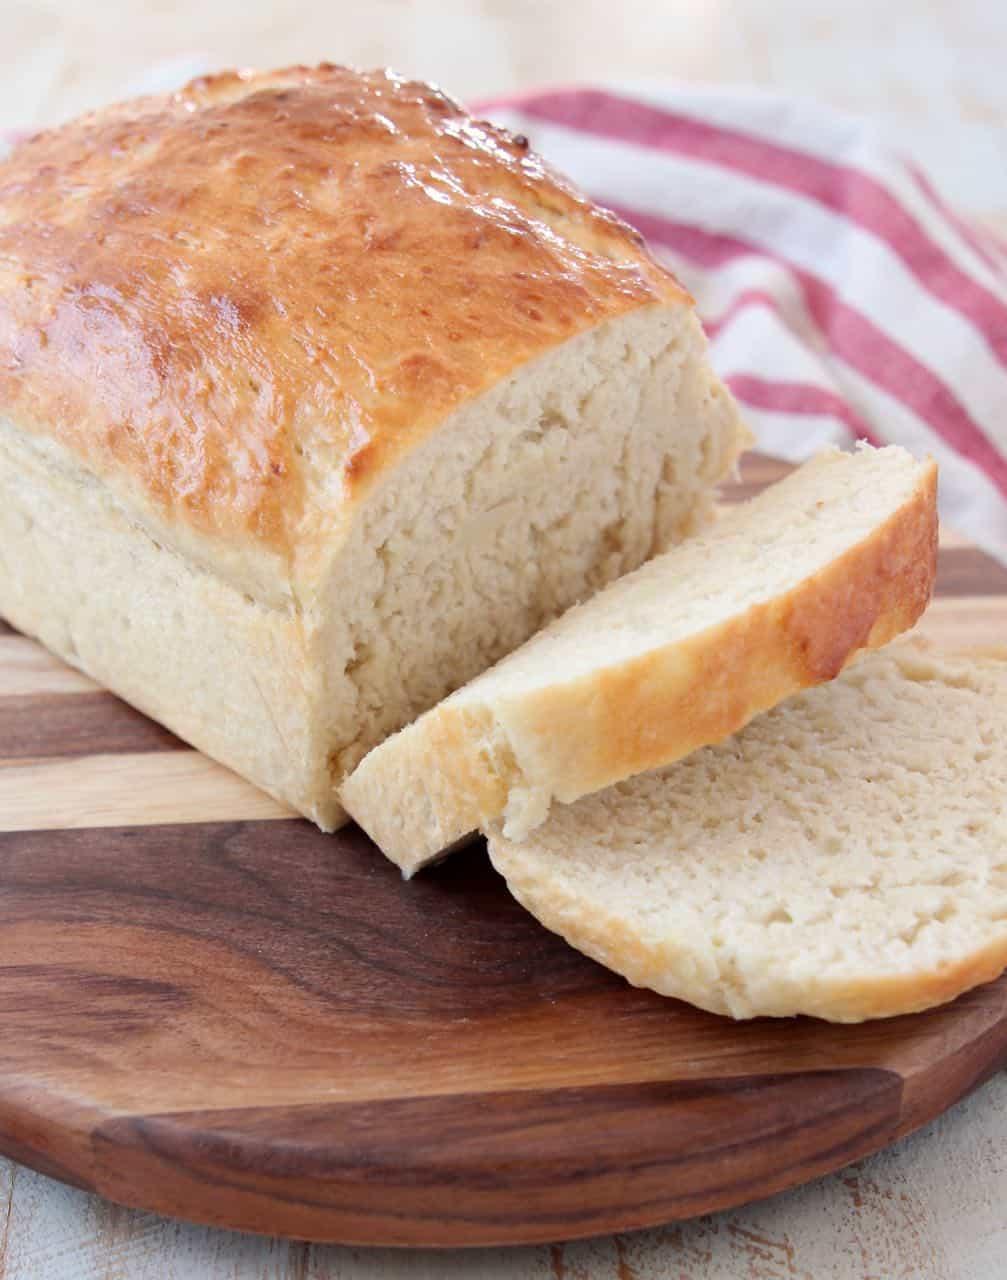 Sliced loaf of potato bread on cutting board